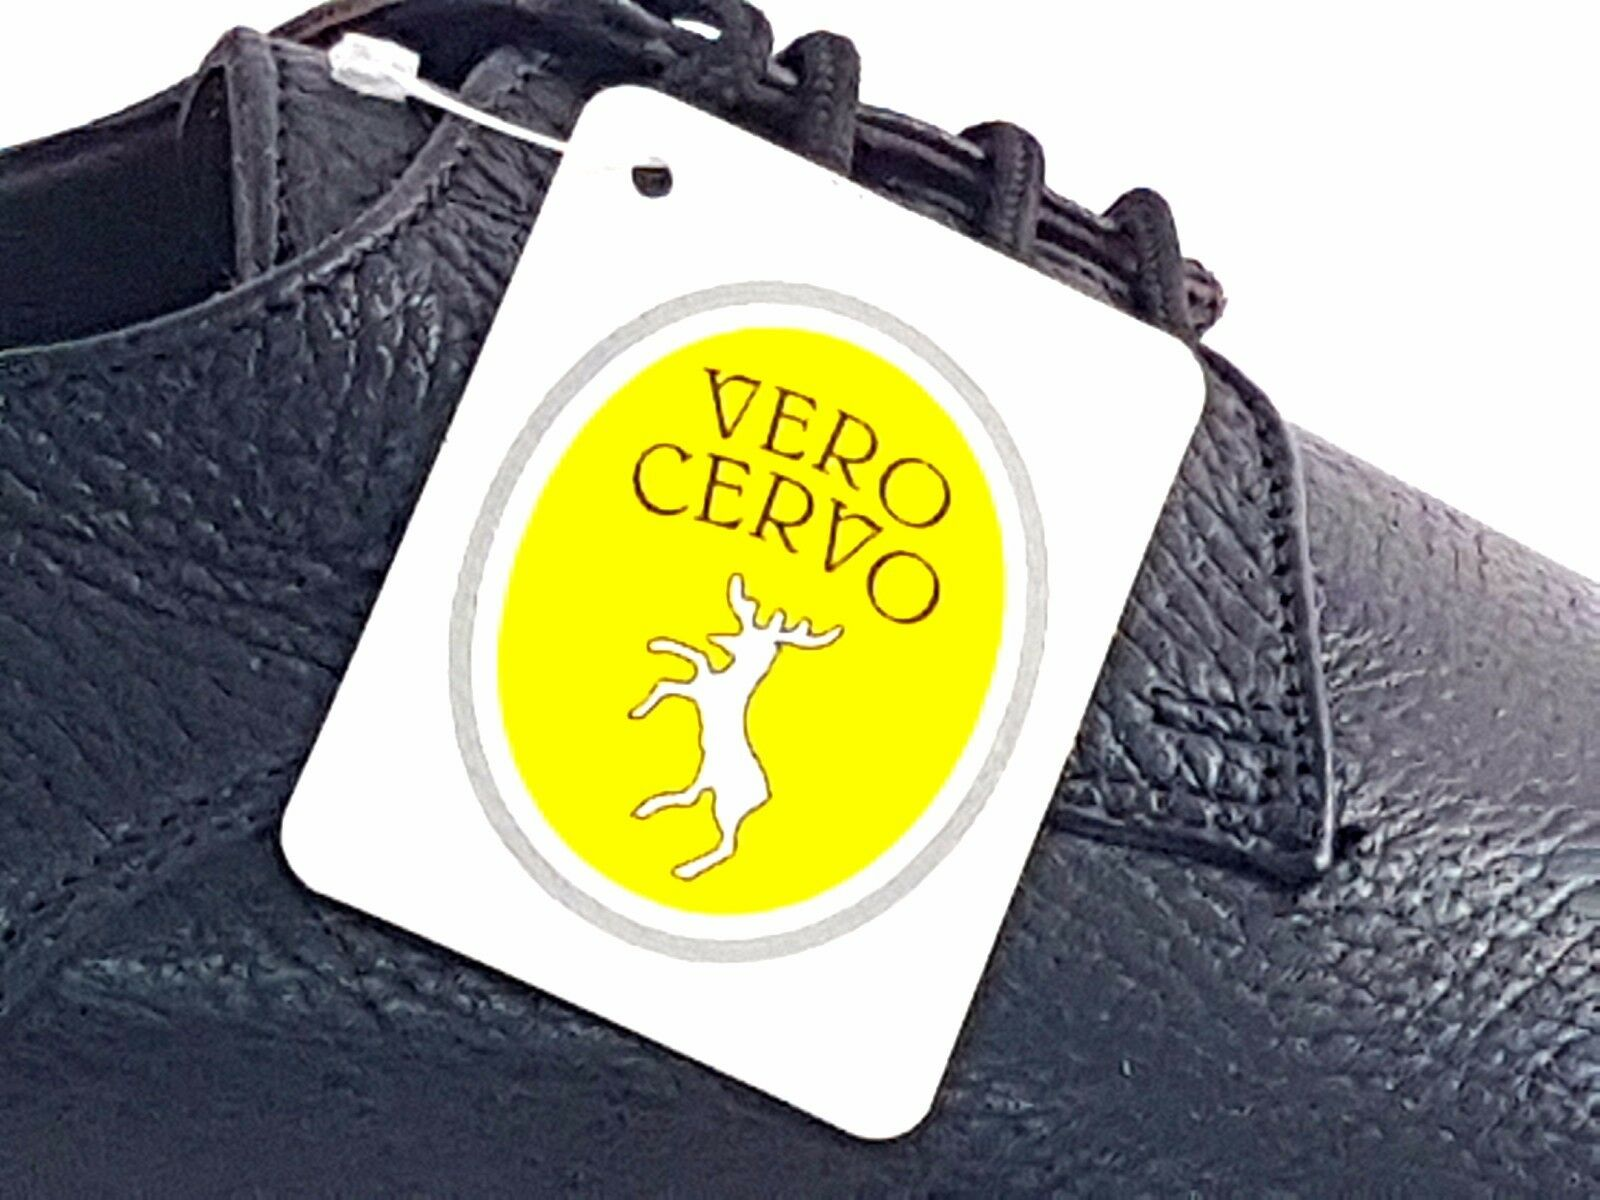 Scarpa classica - vero cervo- made made made in   - Pennezapatos 5577-C dca1ad